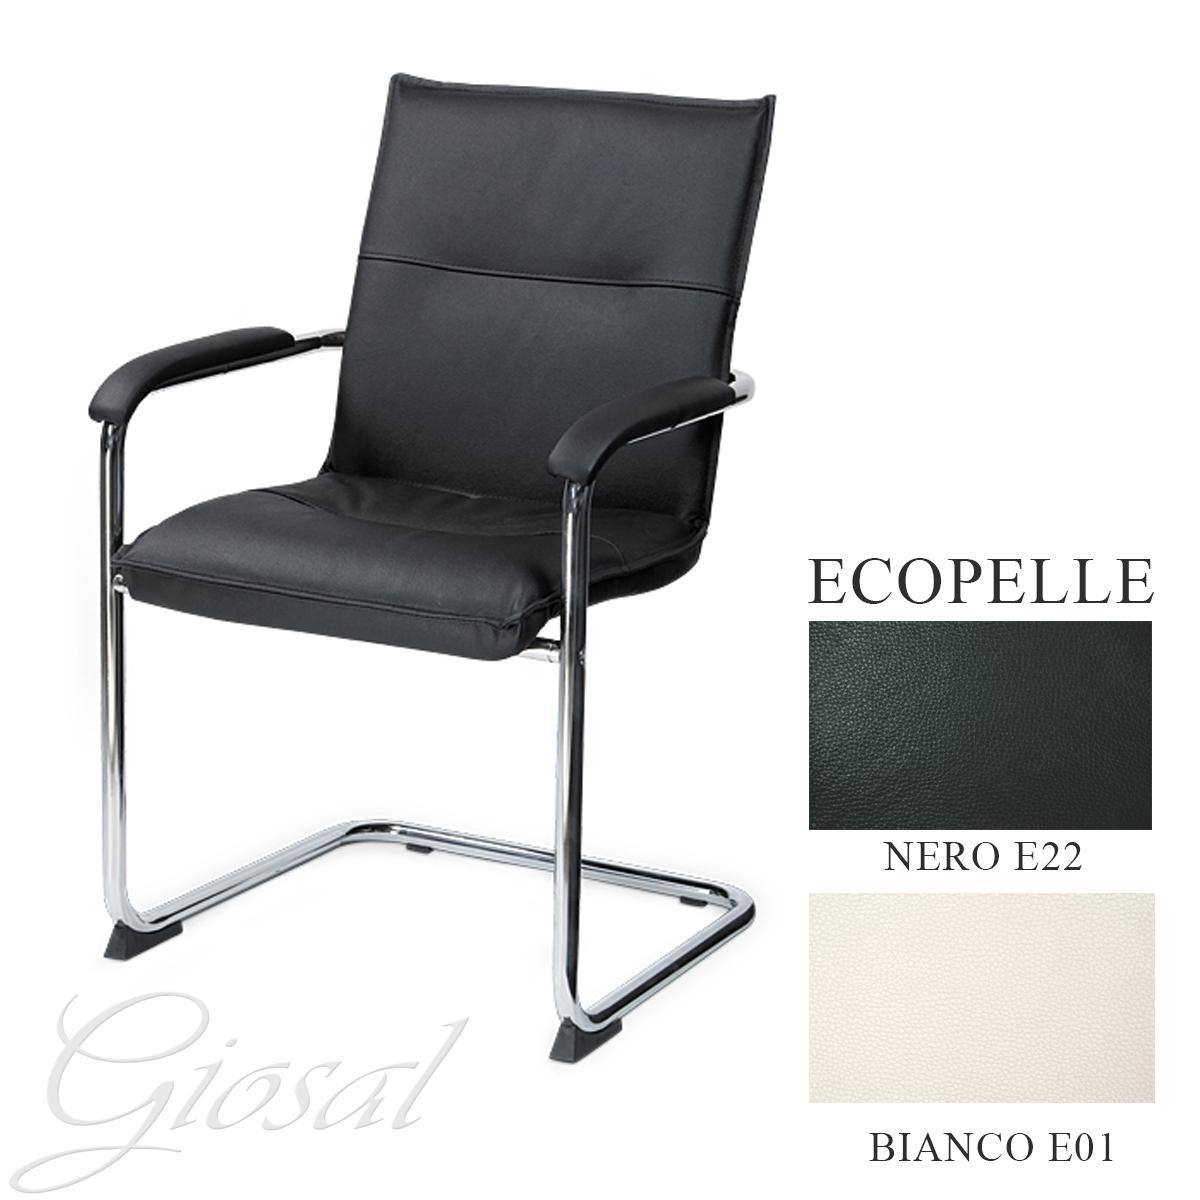 sessel silla schlitten kunstleder wei schwarze pr sidenten b ro kunstleder b ebay. Black Bedroom Furniture Sets. Home Design Ideas